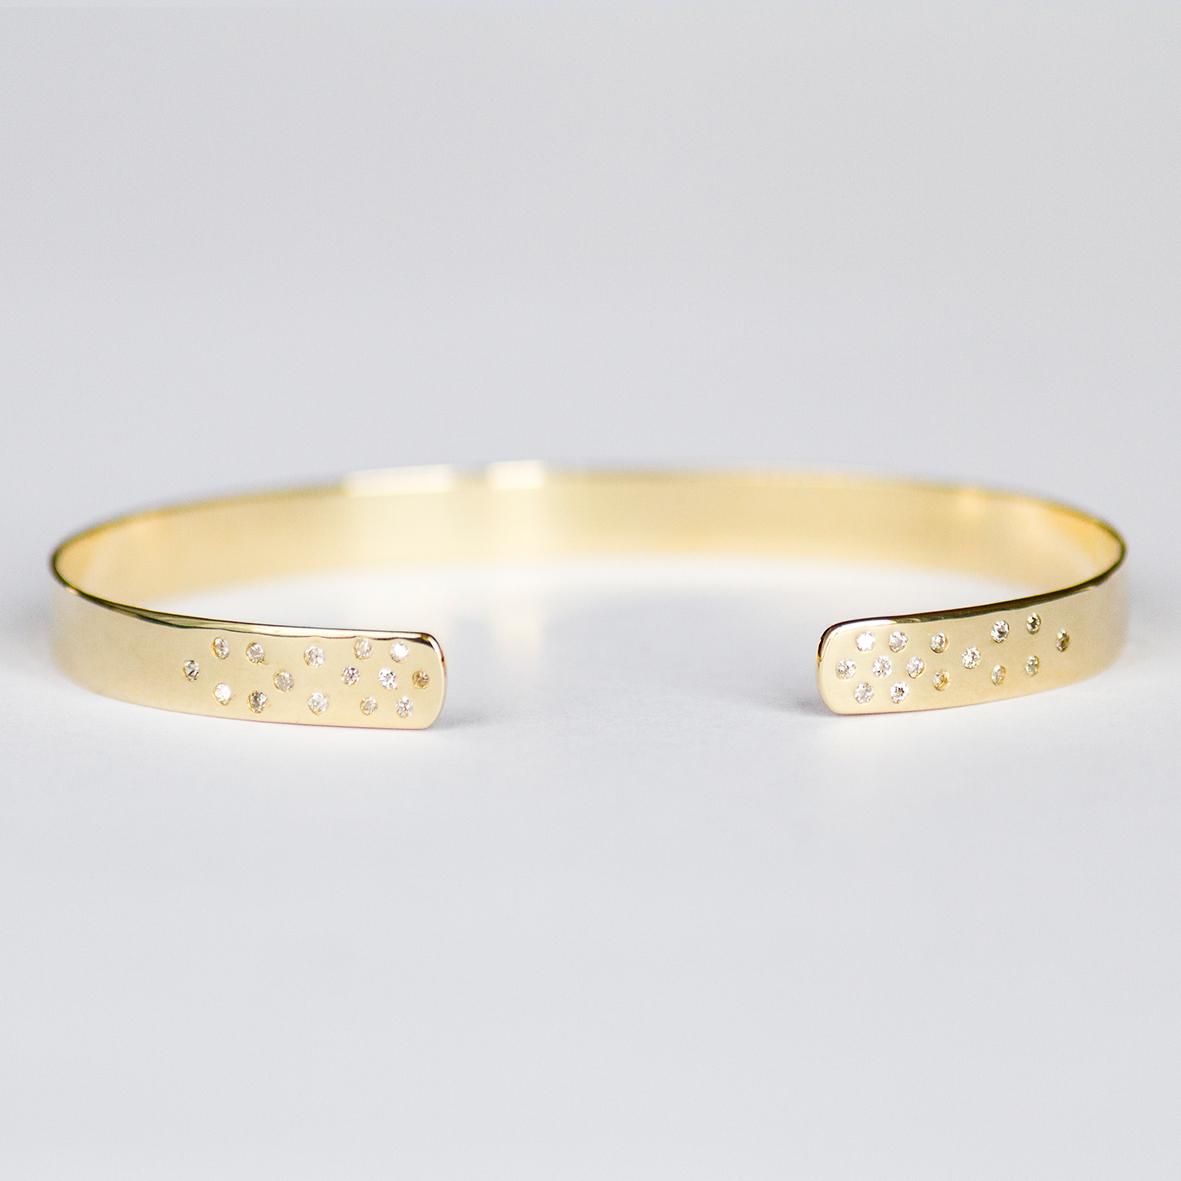 4. OONA_lotus_ficha1_diamond dotted bracelet